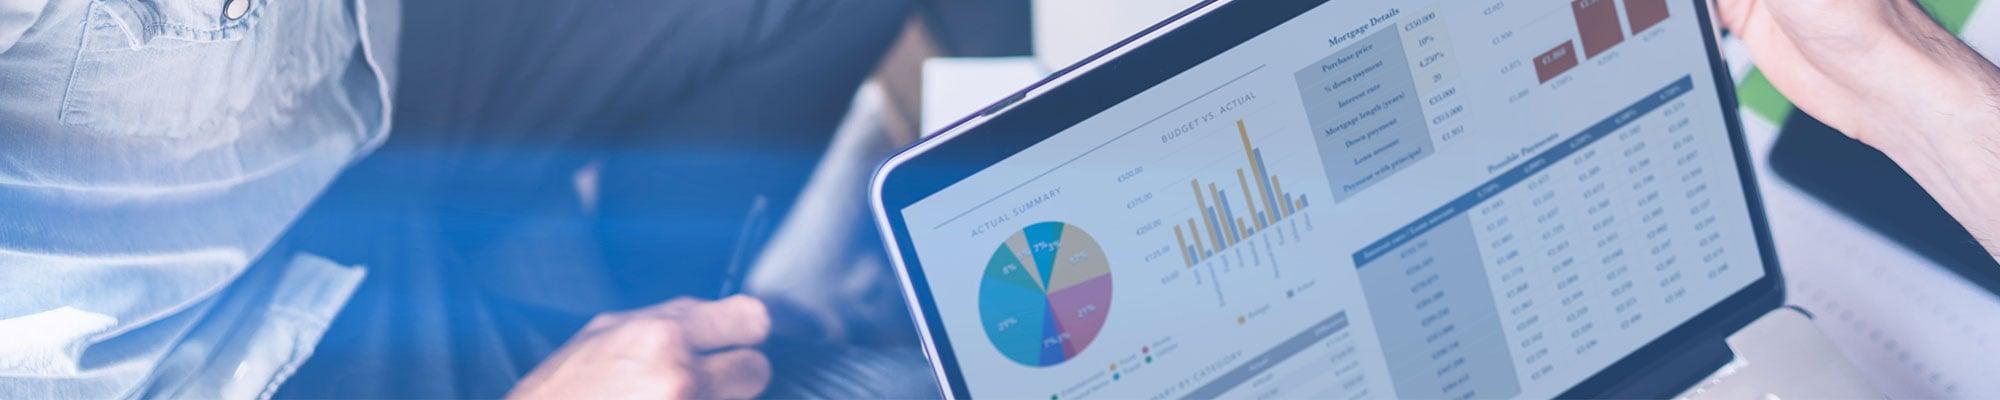 Women's Leadership Institute - Talent Analytics